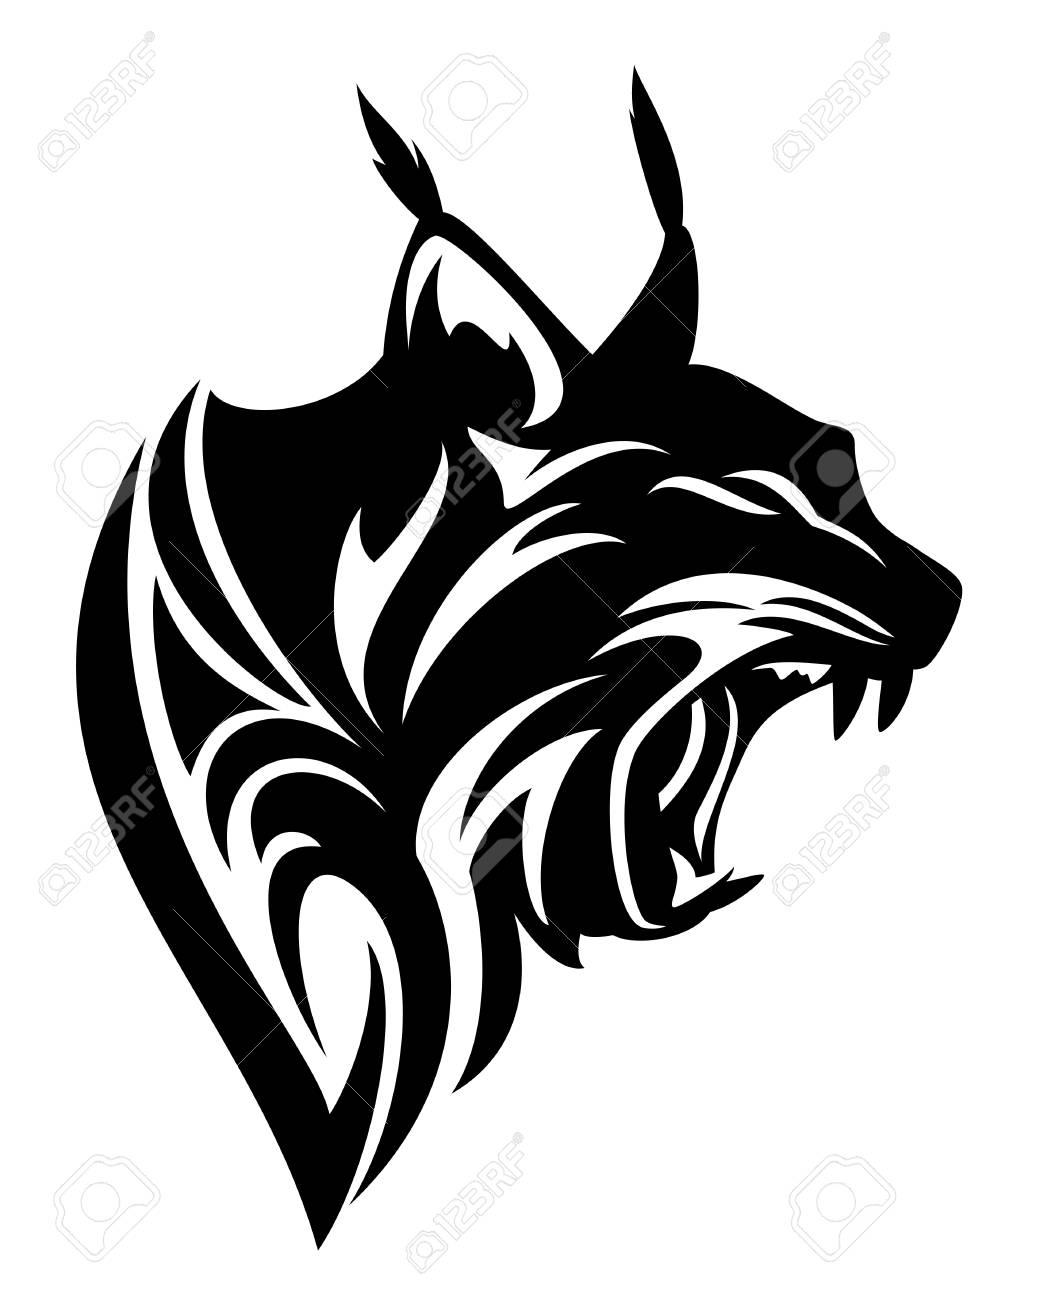 Roaring lynx profile head black and white vector tribal design stock vector 87782091